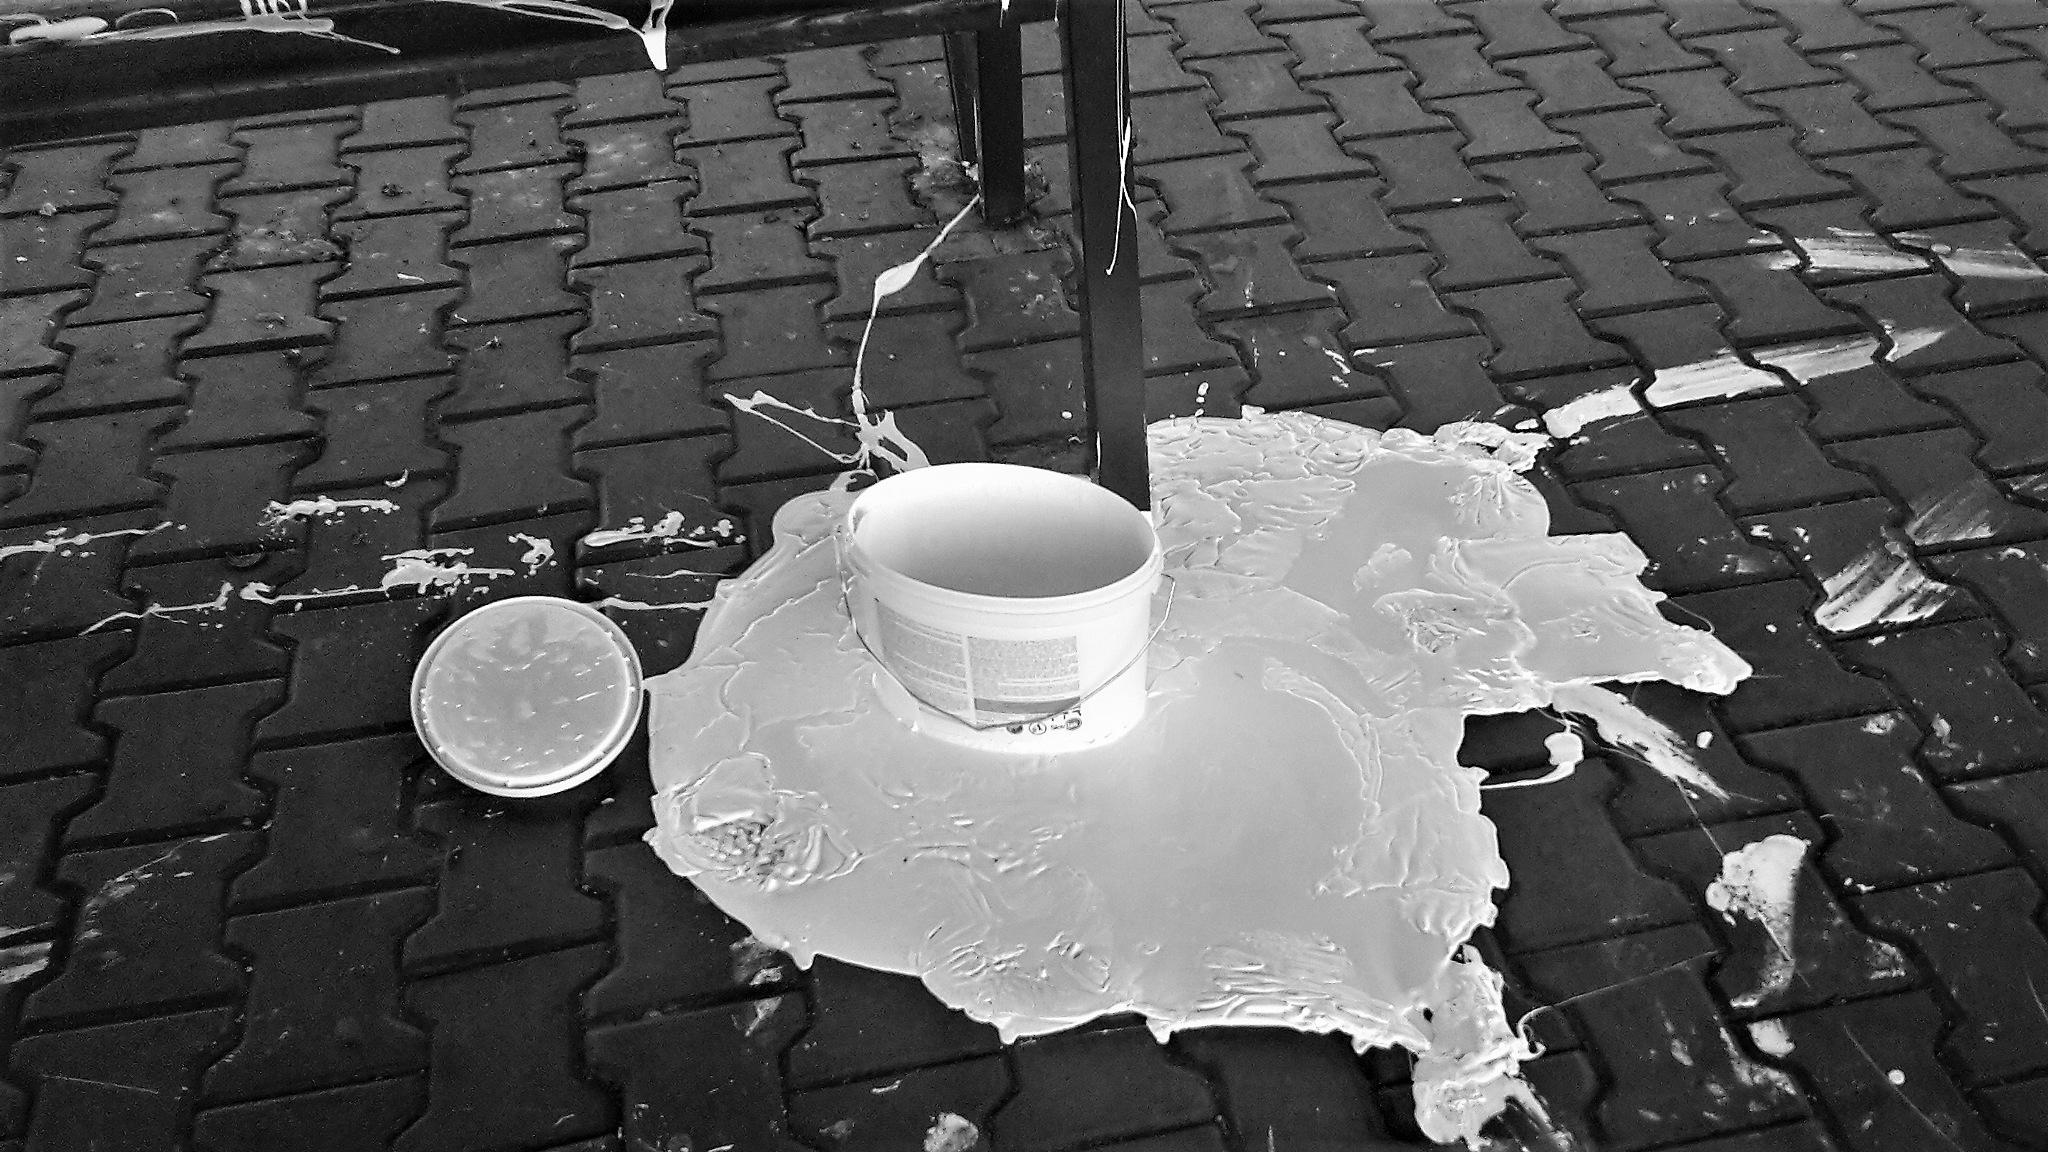 White :-) by  robert pojedinec robert